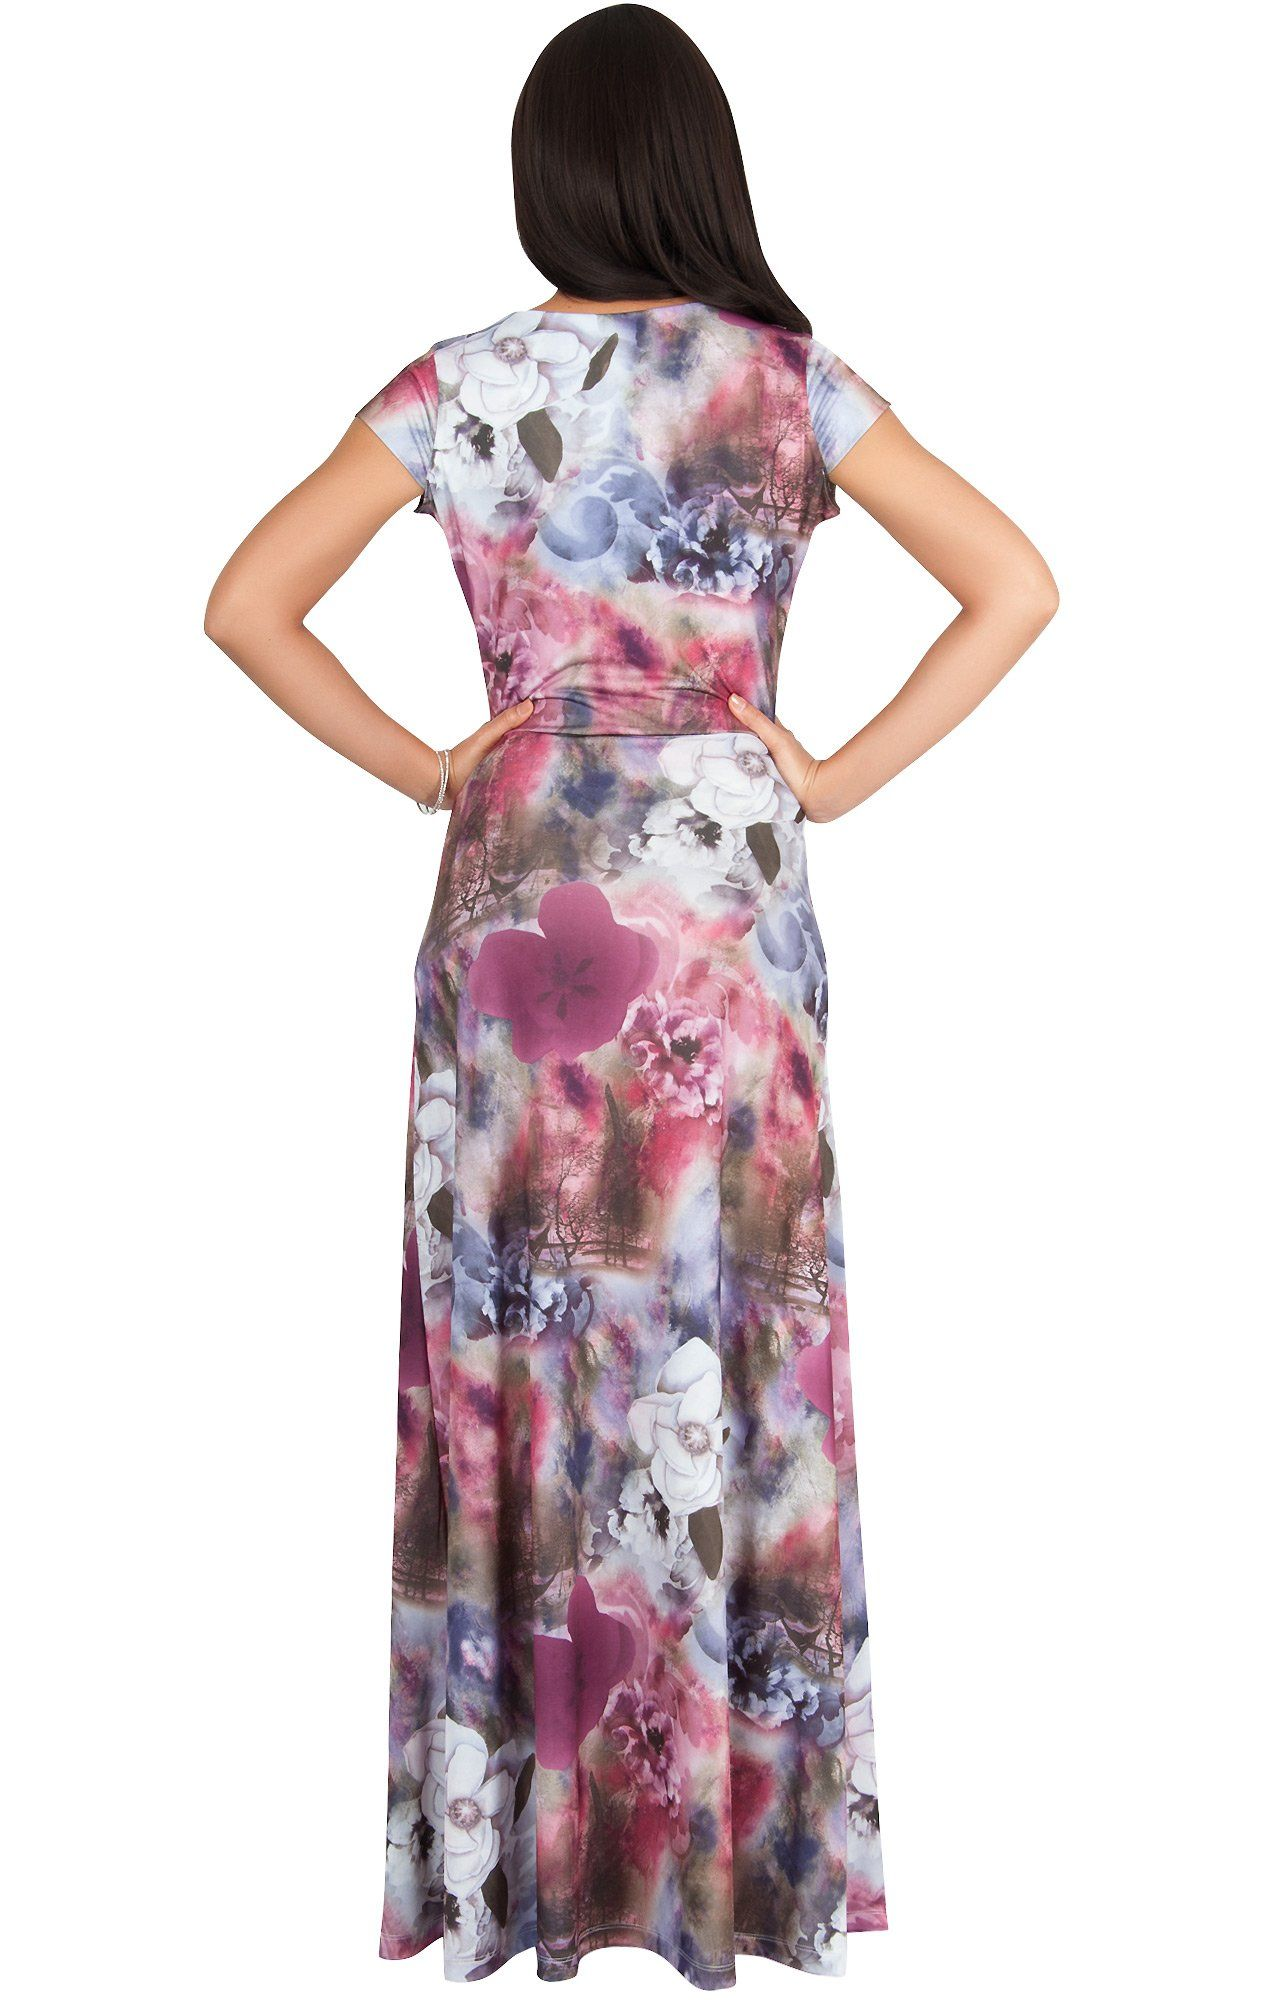 58b6052c6e Maternity Fashion - KOH KOH Women Long Cap Short Sleeve Floral Print VNeck  Boho Flowy Summer Casual Formal Sexy Sundress Sundresses Gown Gowns Maxi  Dress ...